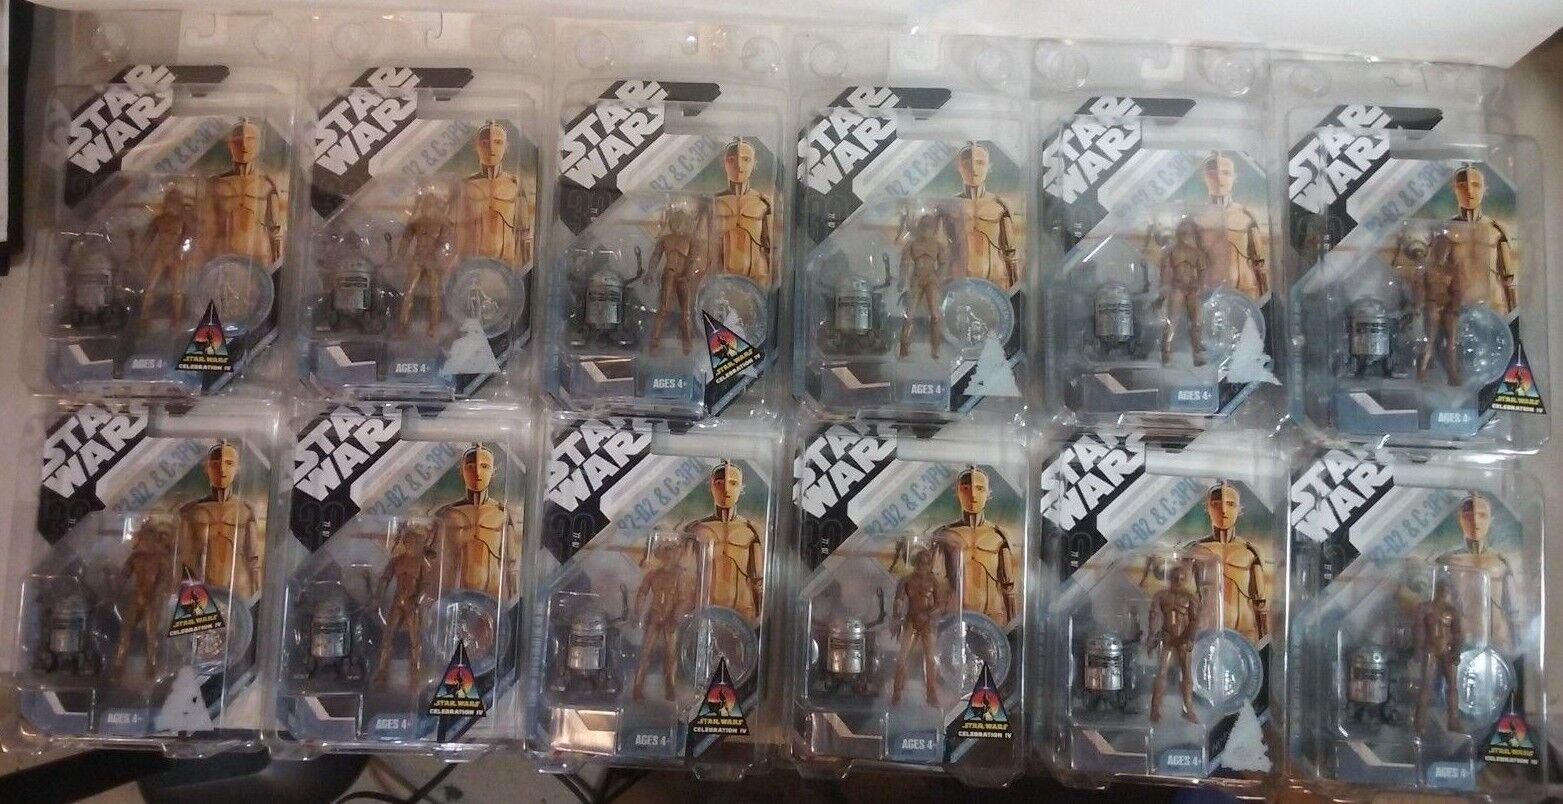 Star Star Star Wars Celebration IV Ralph Mcquarrie Concept R2-D2&C-3PO Figures Case of 12 d9a7e1